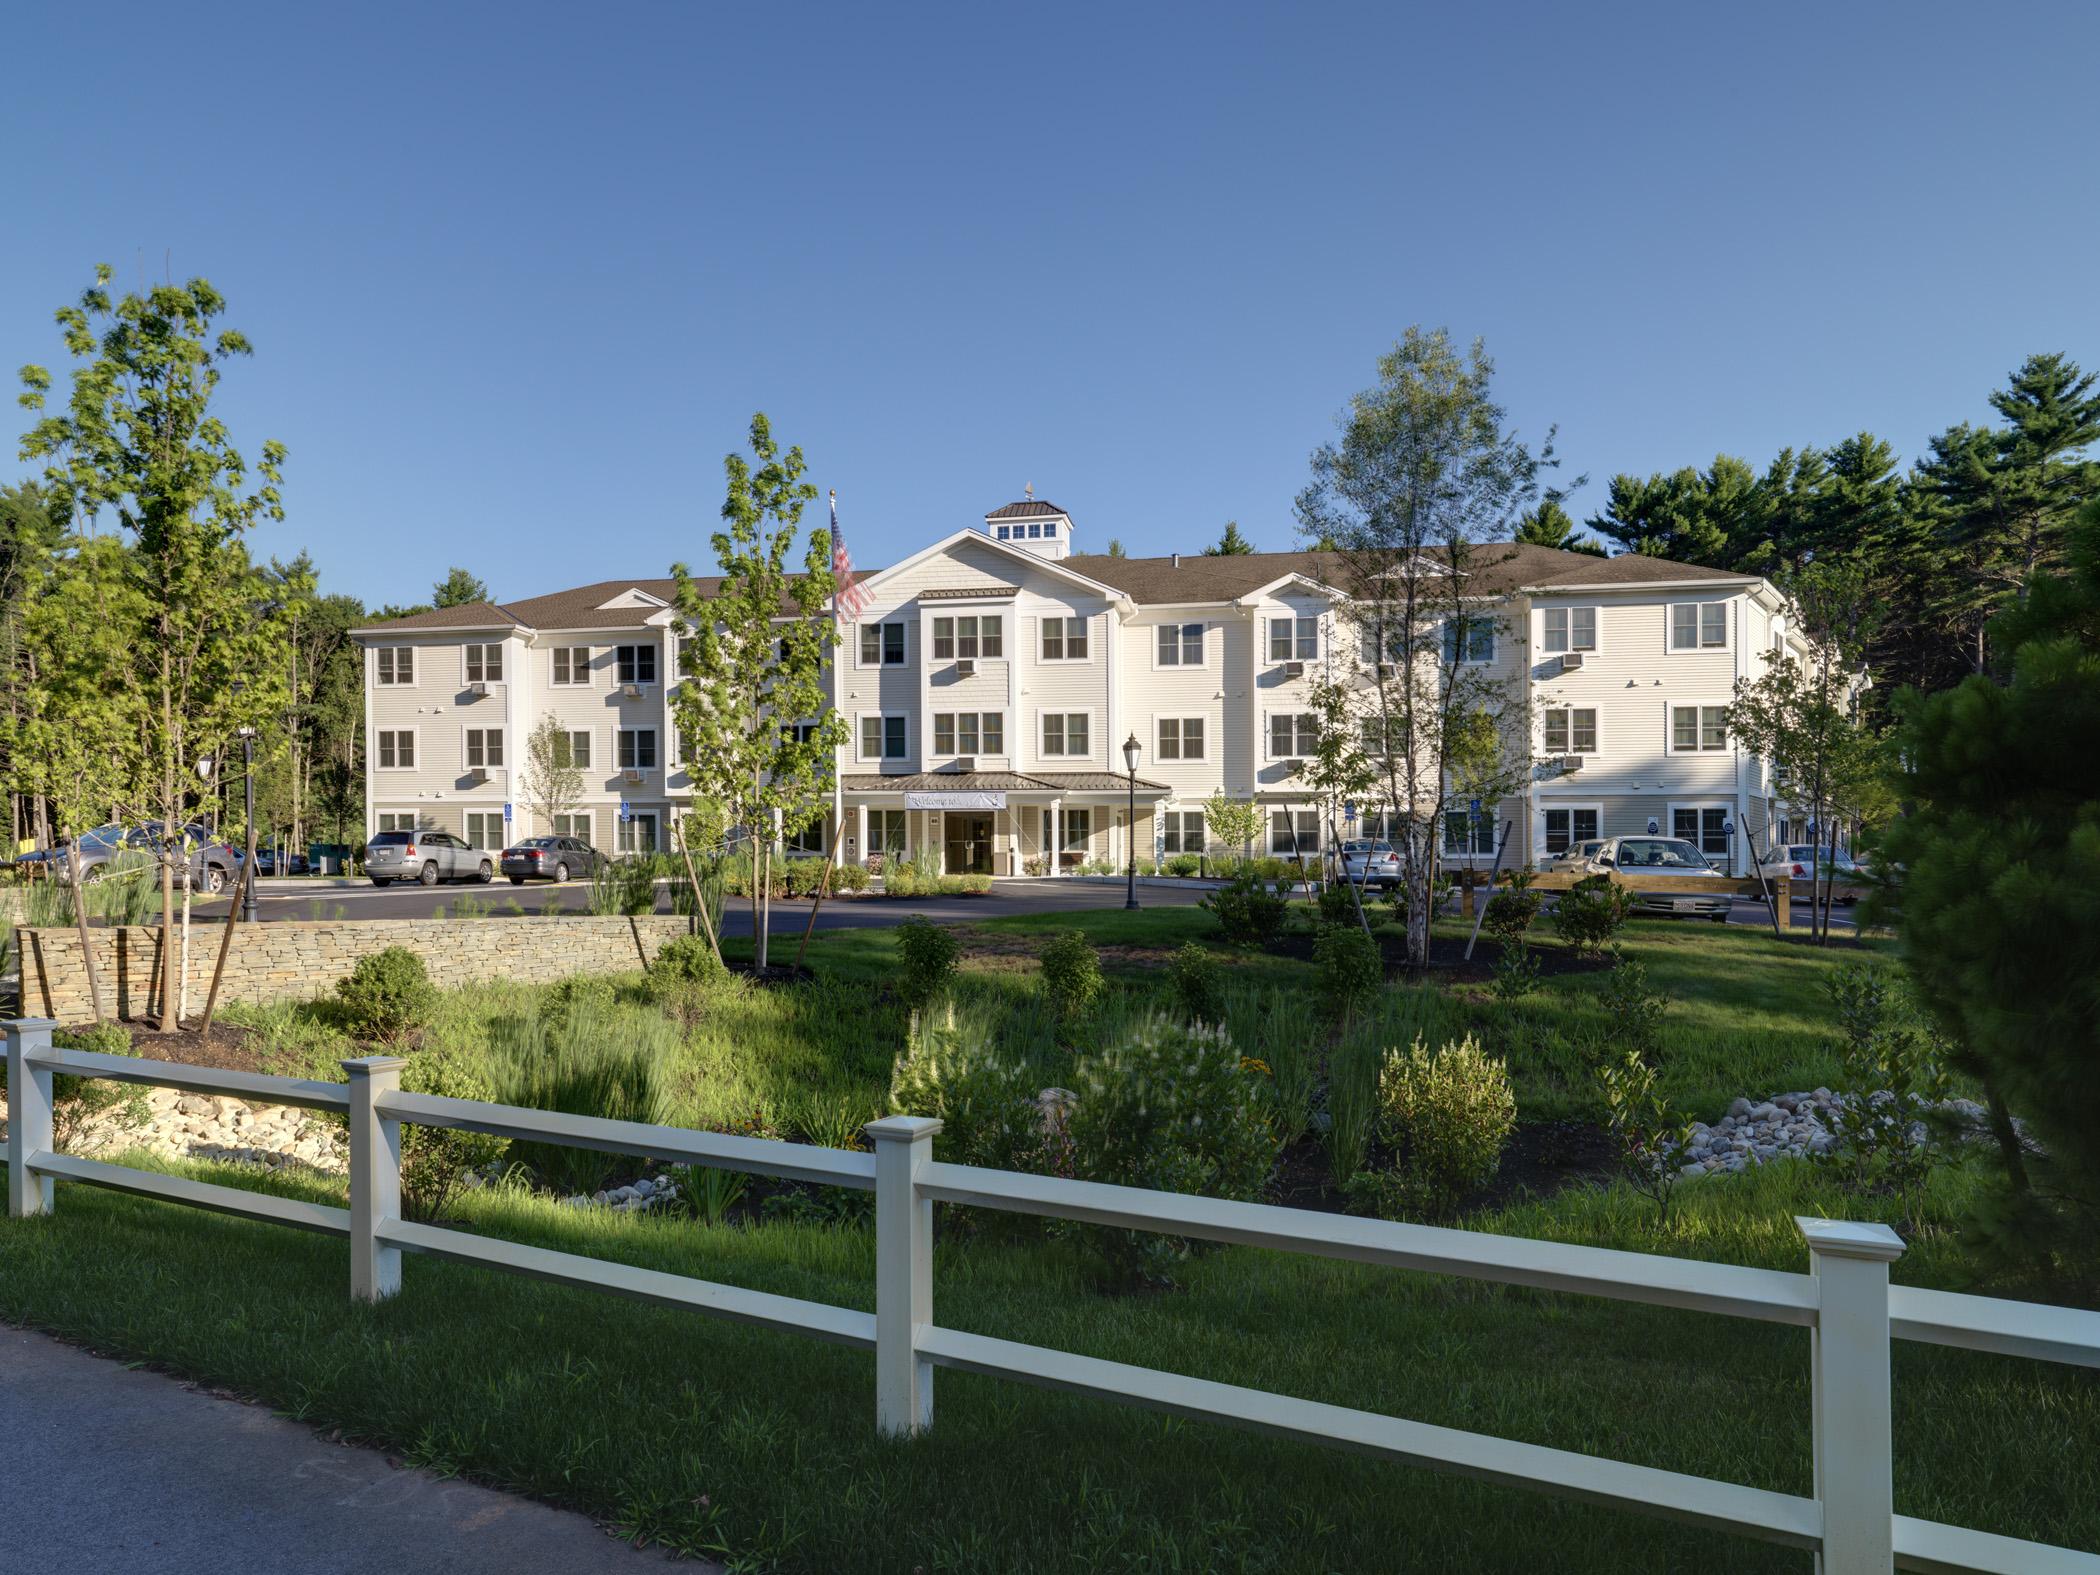 Barstow Village - Hanover, MA